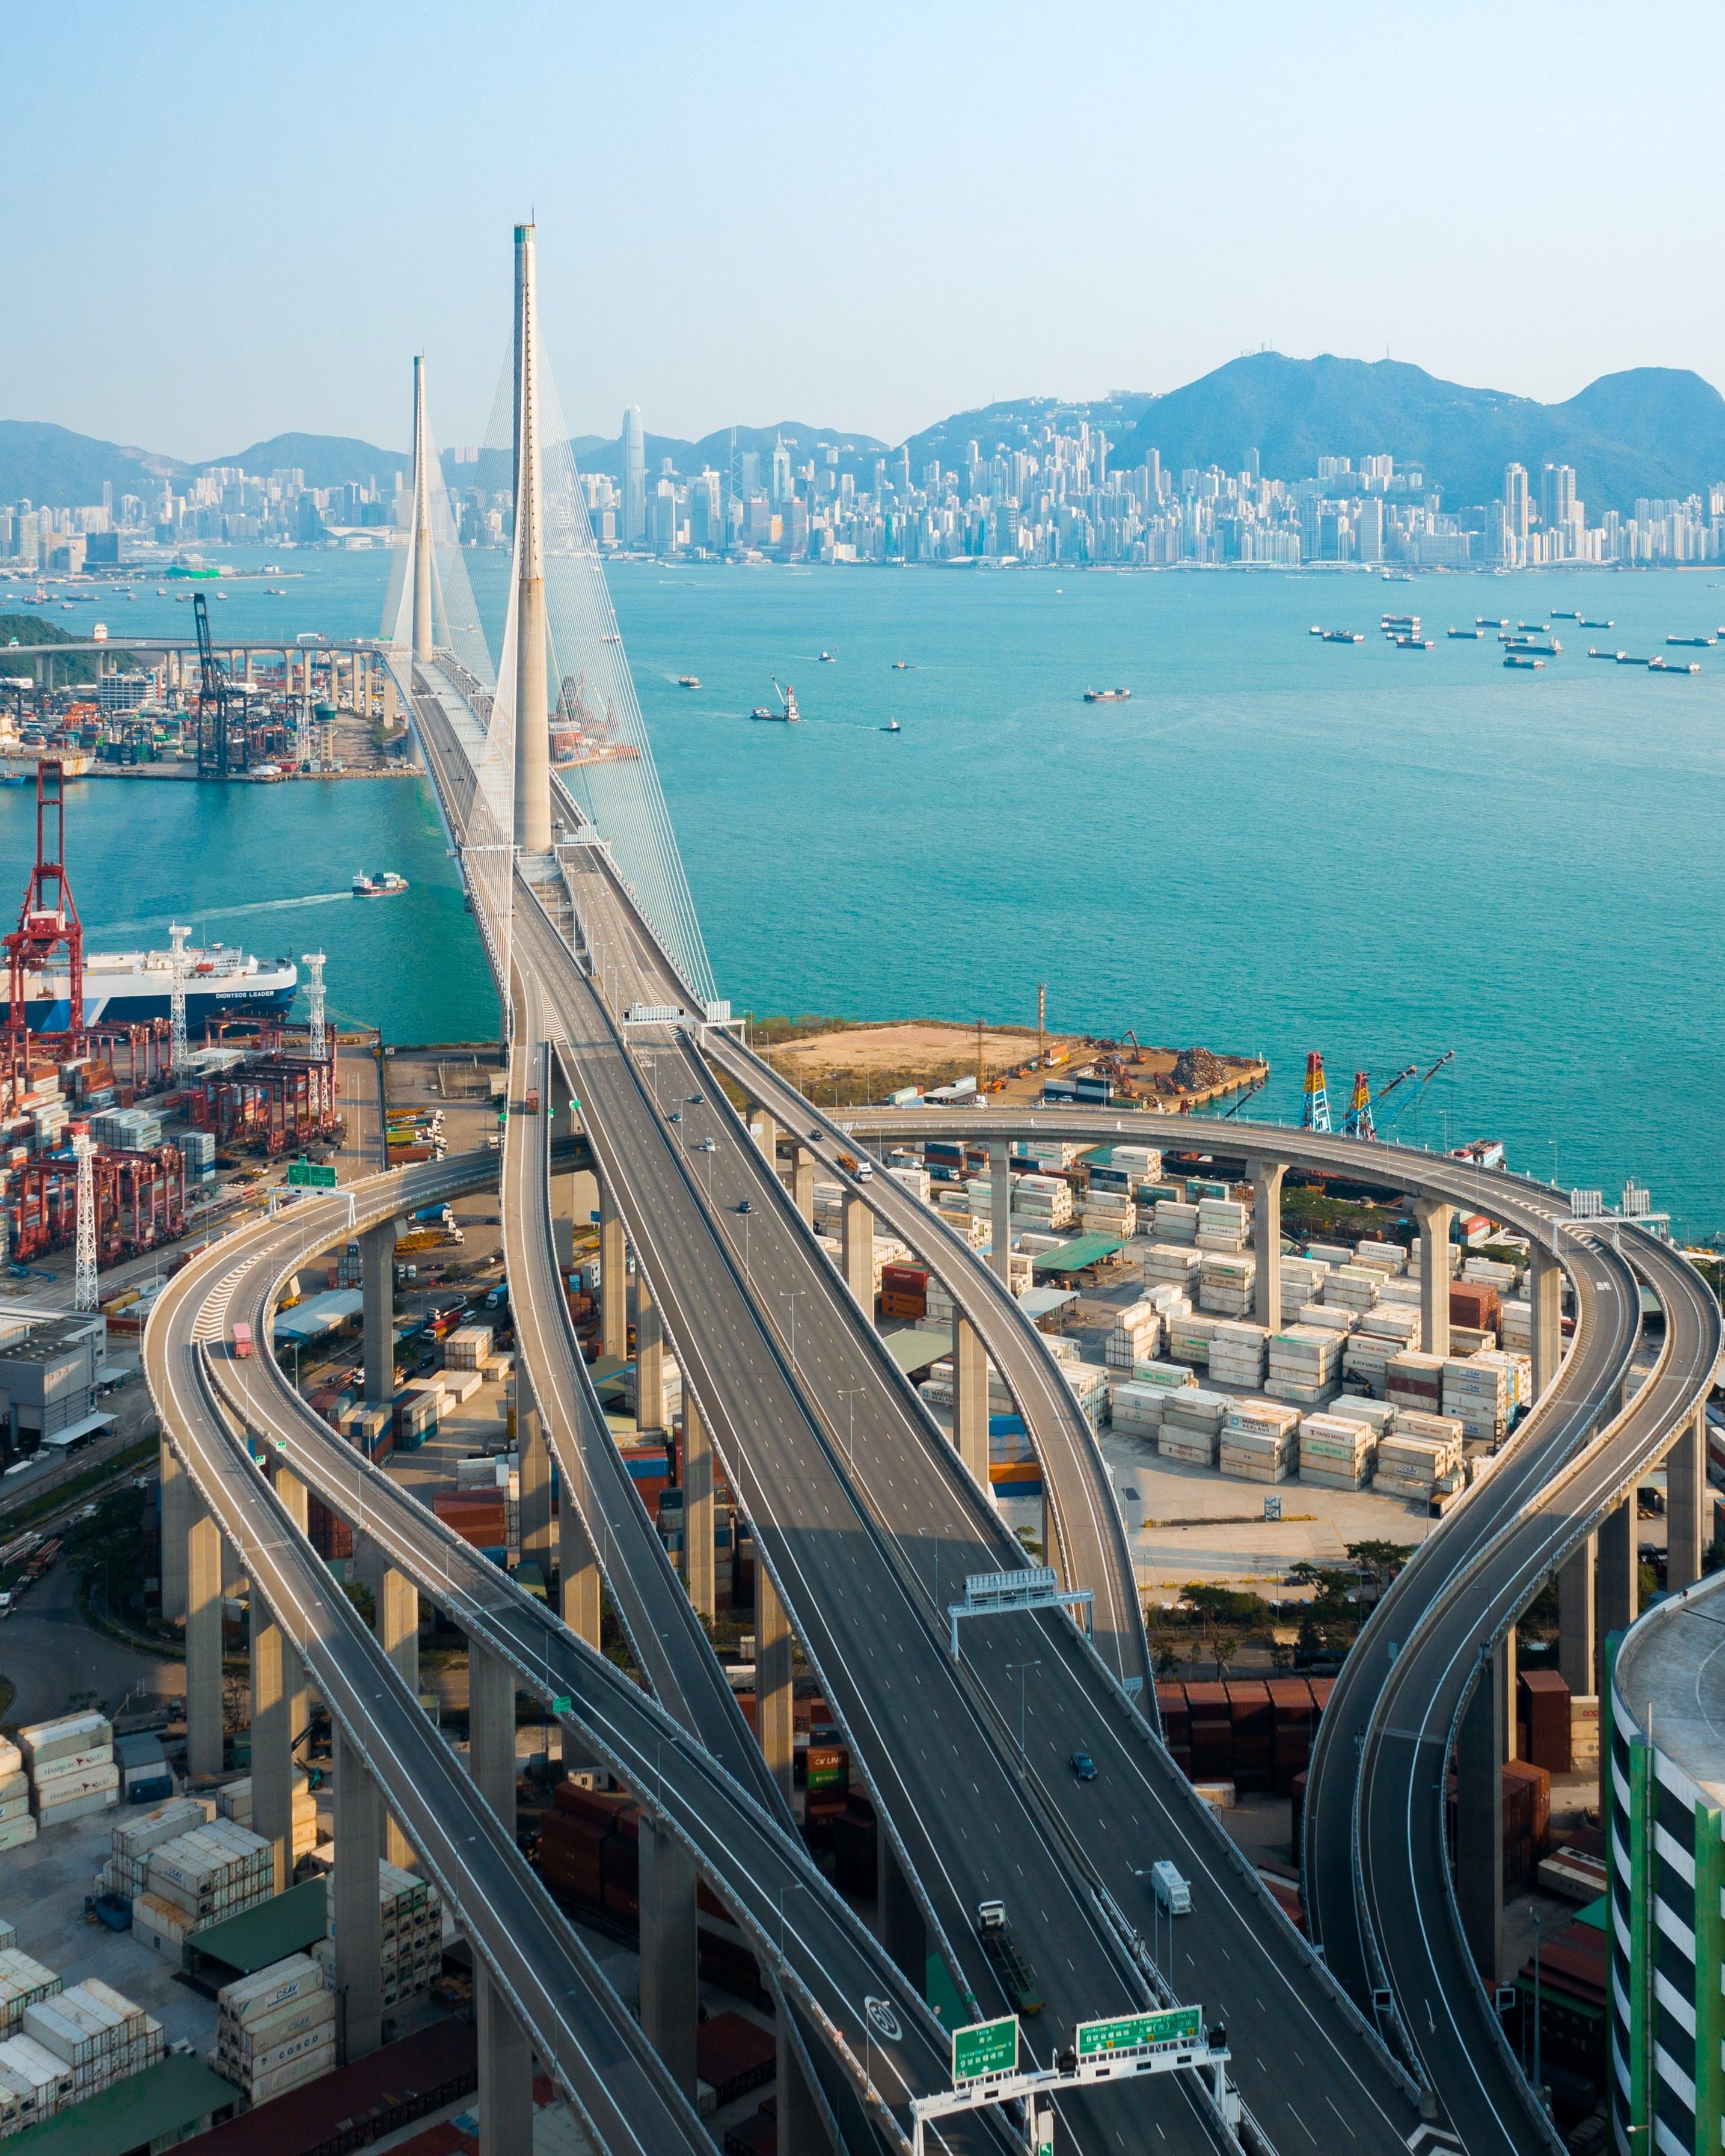 Suspension bridge in Hong Kong, China